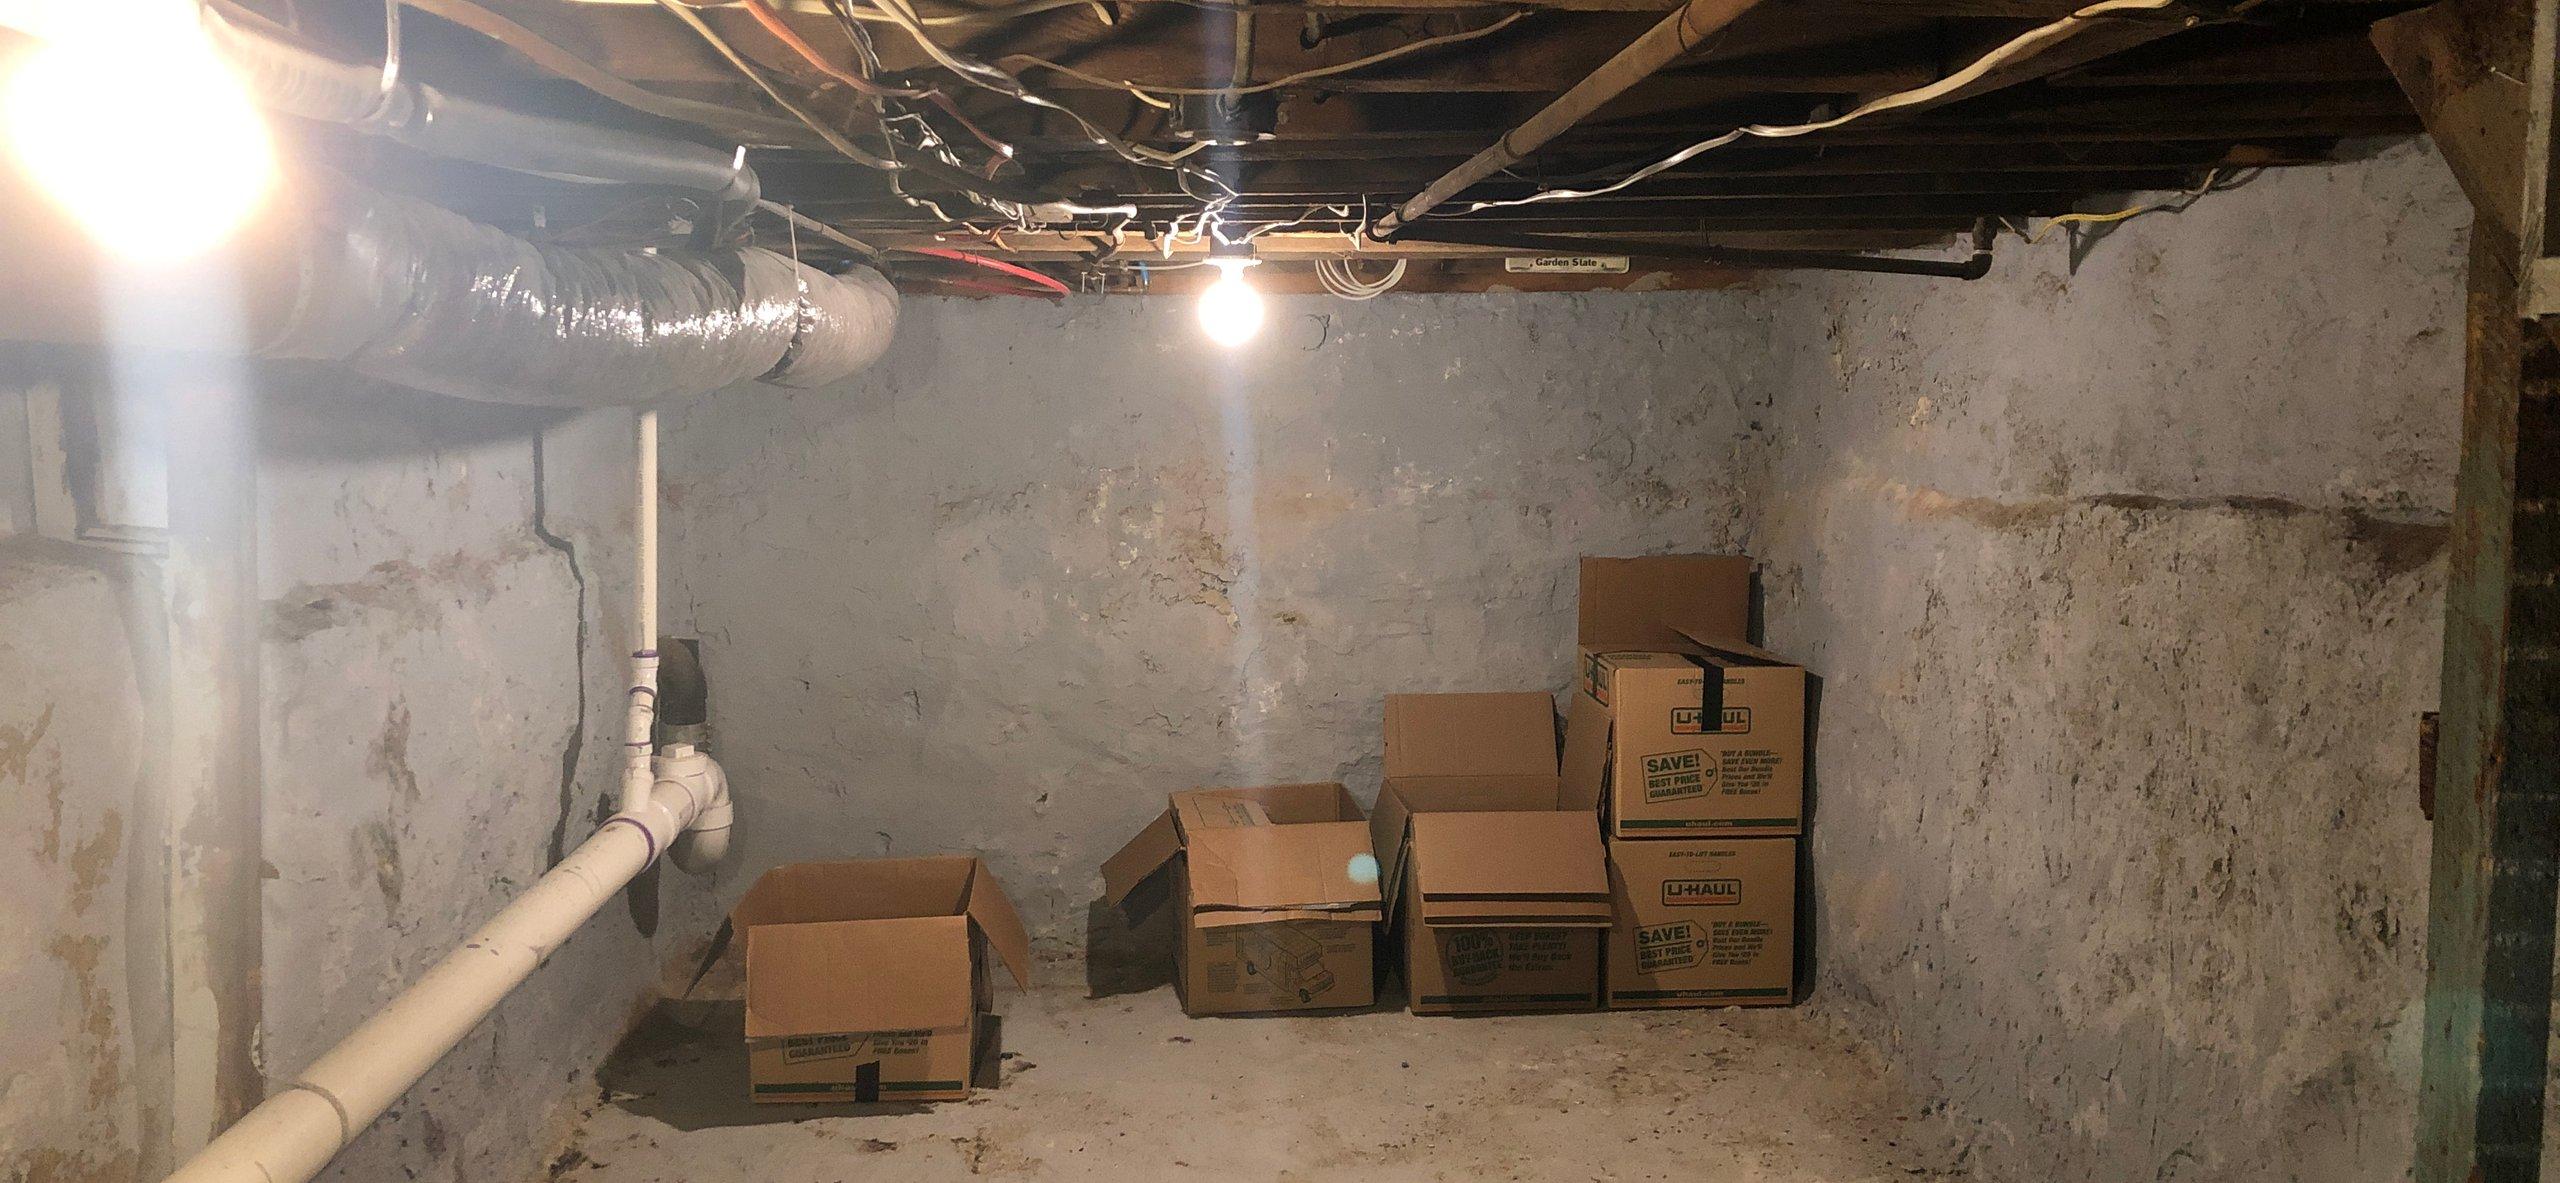 11x9 Basement self storage unit